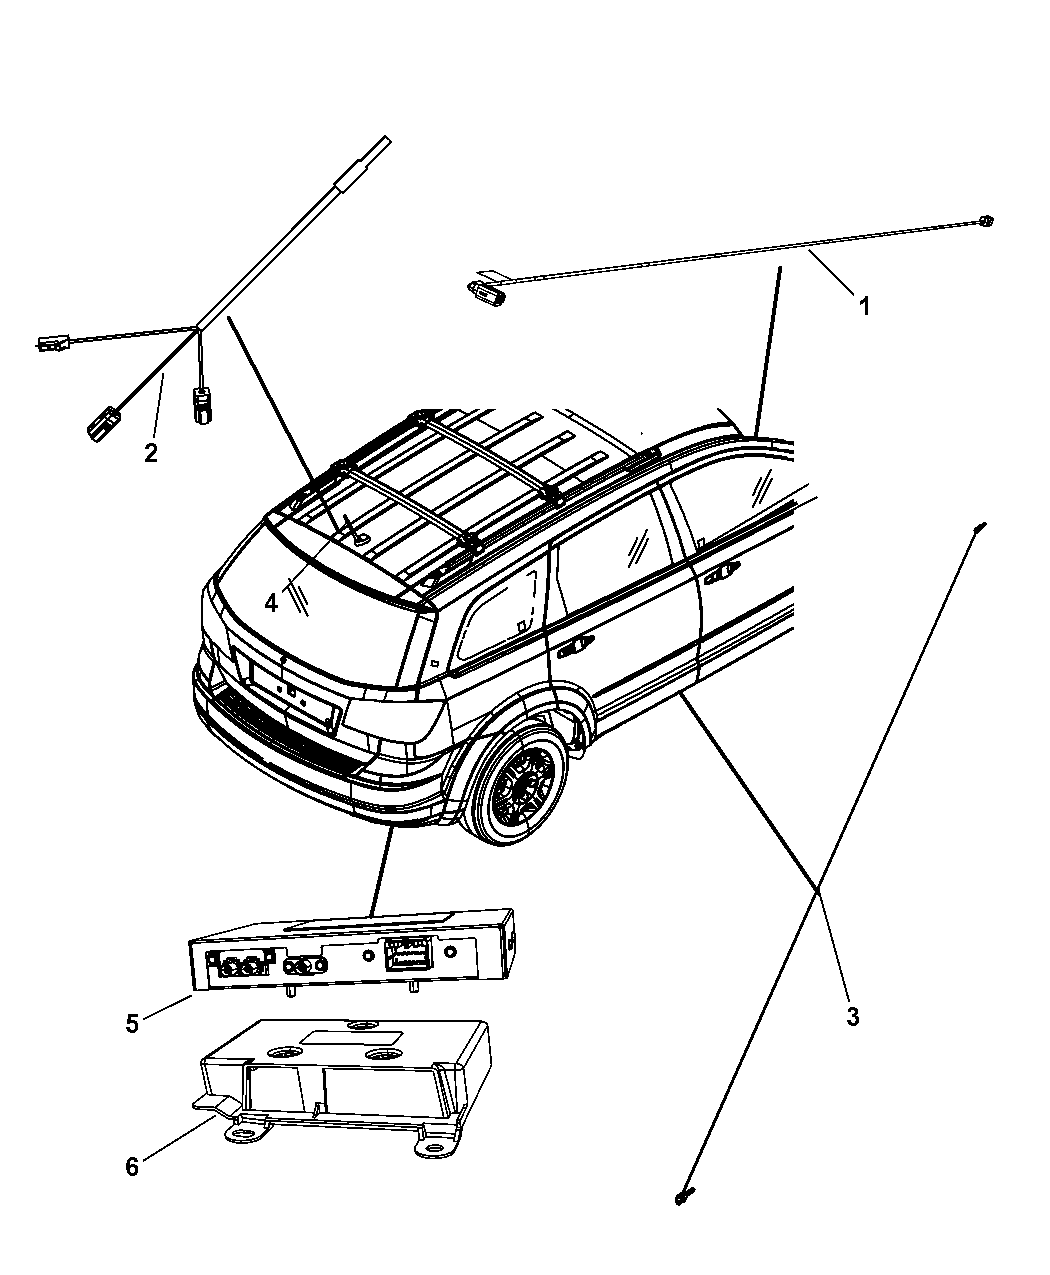 Genuine Chrysler BASE-BASE CABLE AND BRACKET